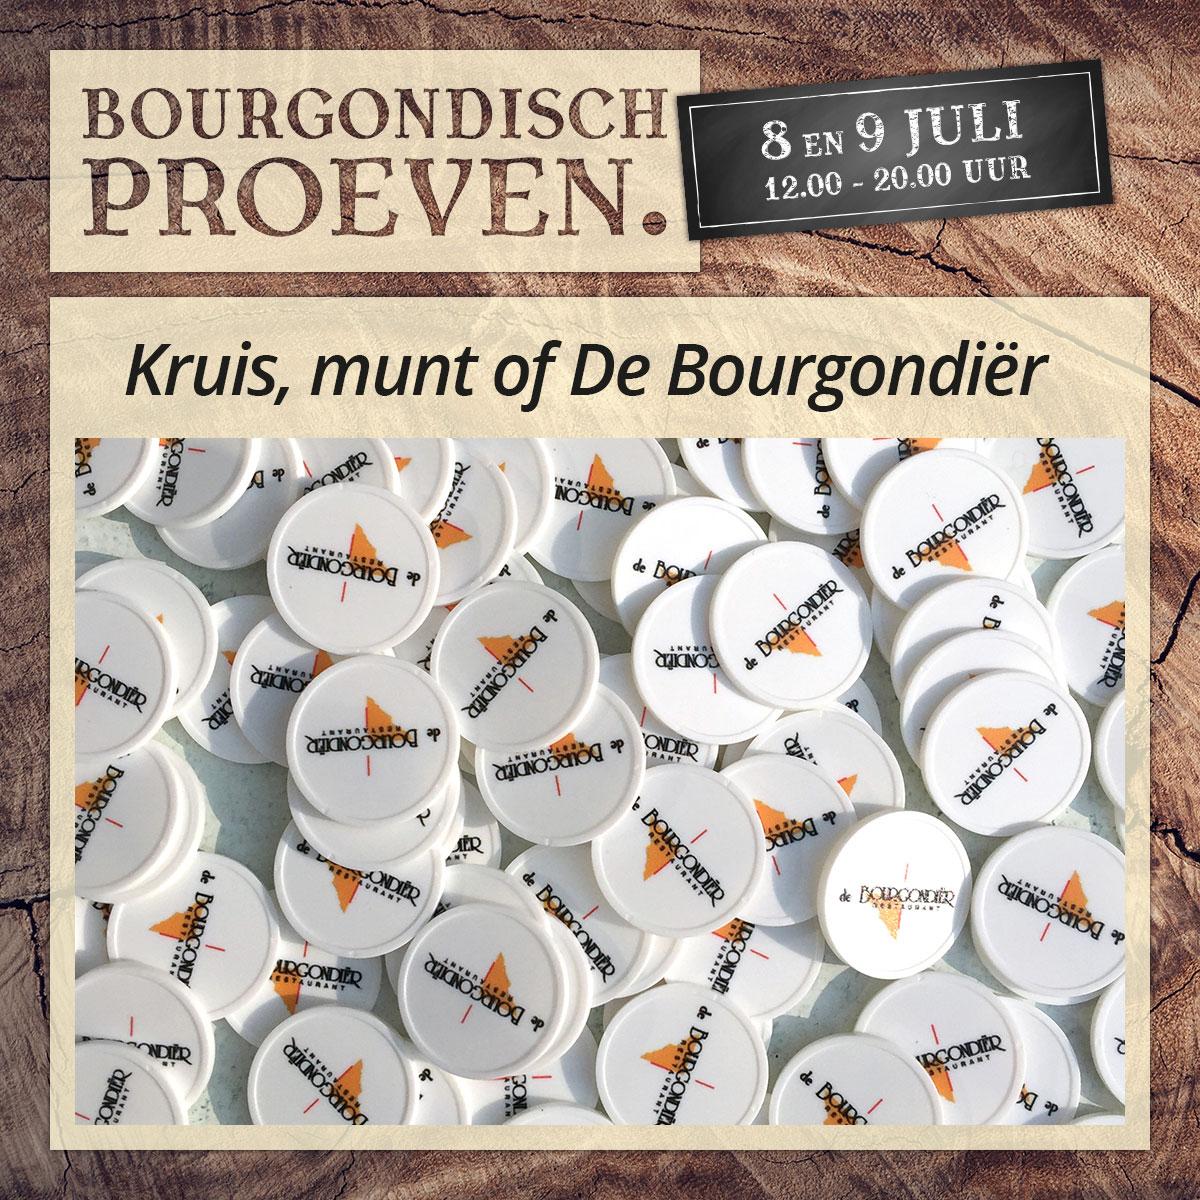 De Bourgondiër – Bourgondisch Proeven. – Facebookbericht – Kruis-munt-of-De-Bourgondiër